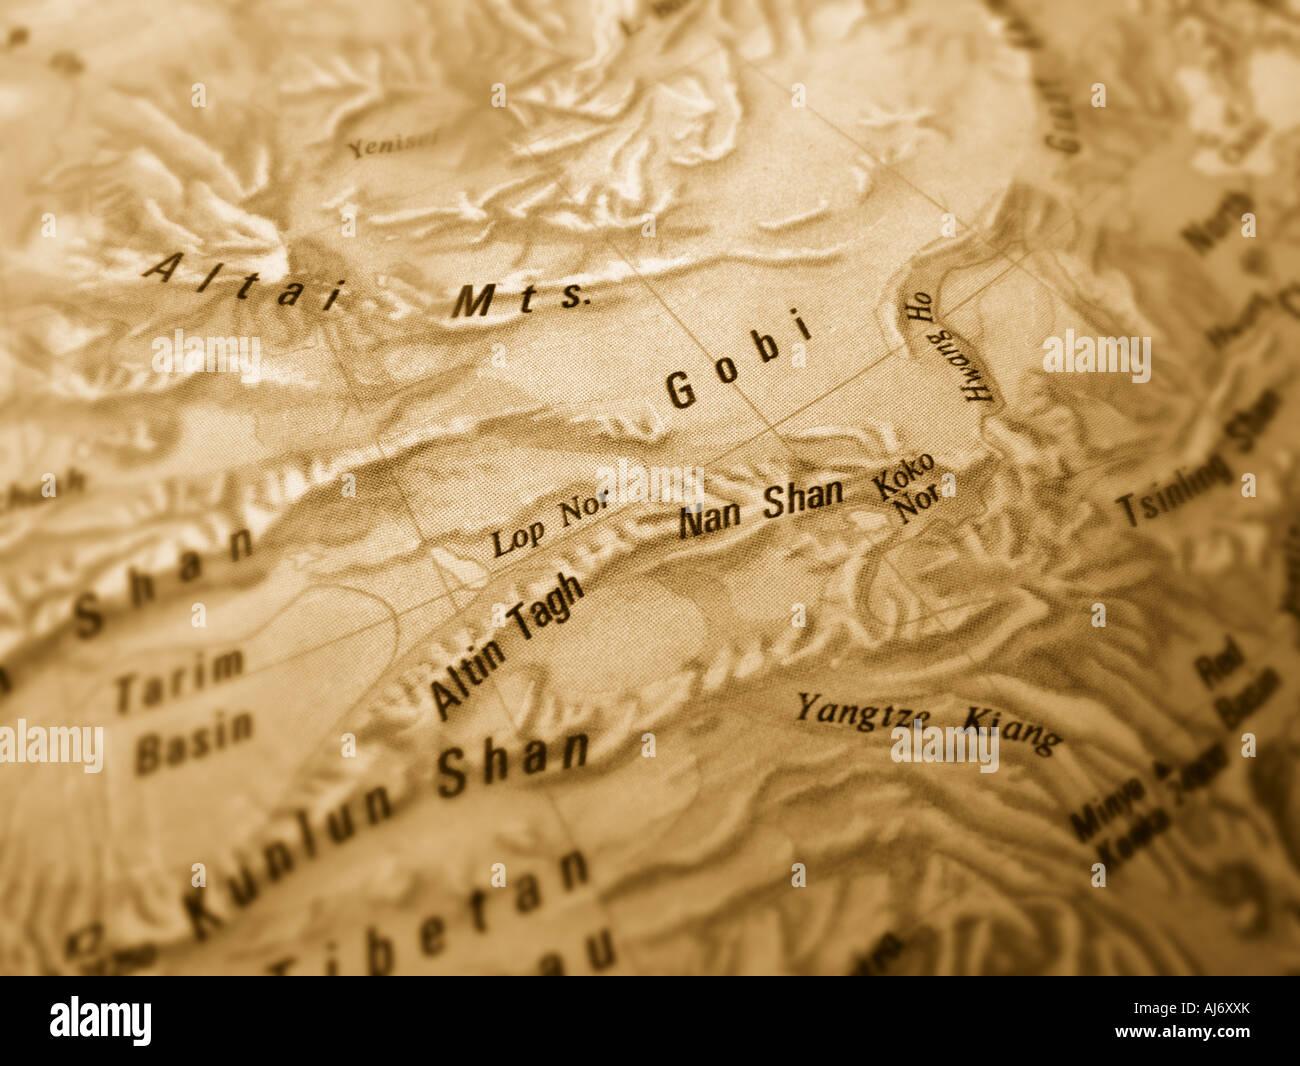 gobi desert map Stock Photo: 14641626 - Alamy